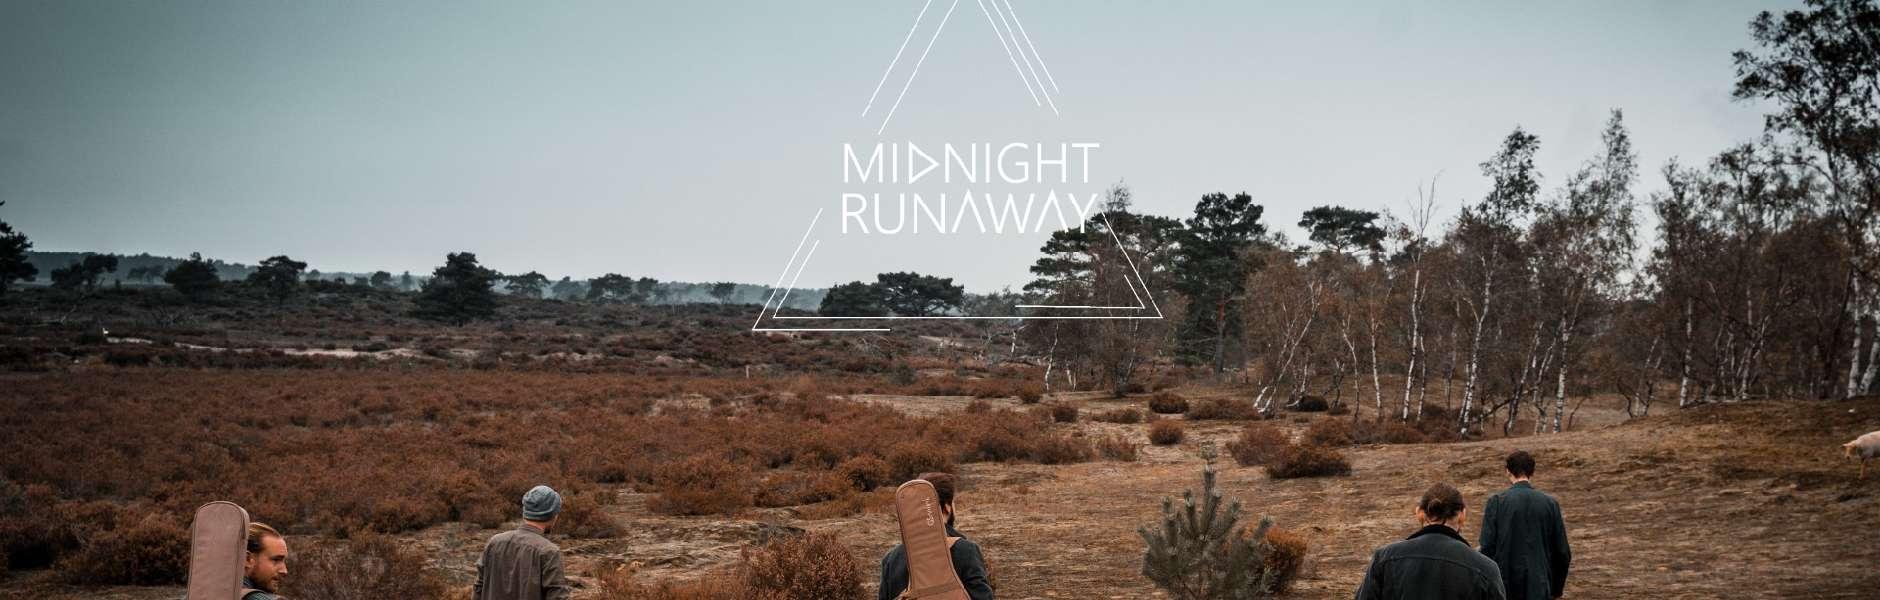 Midnight Runaway